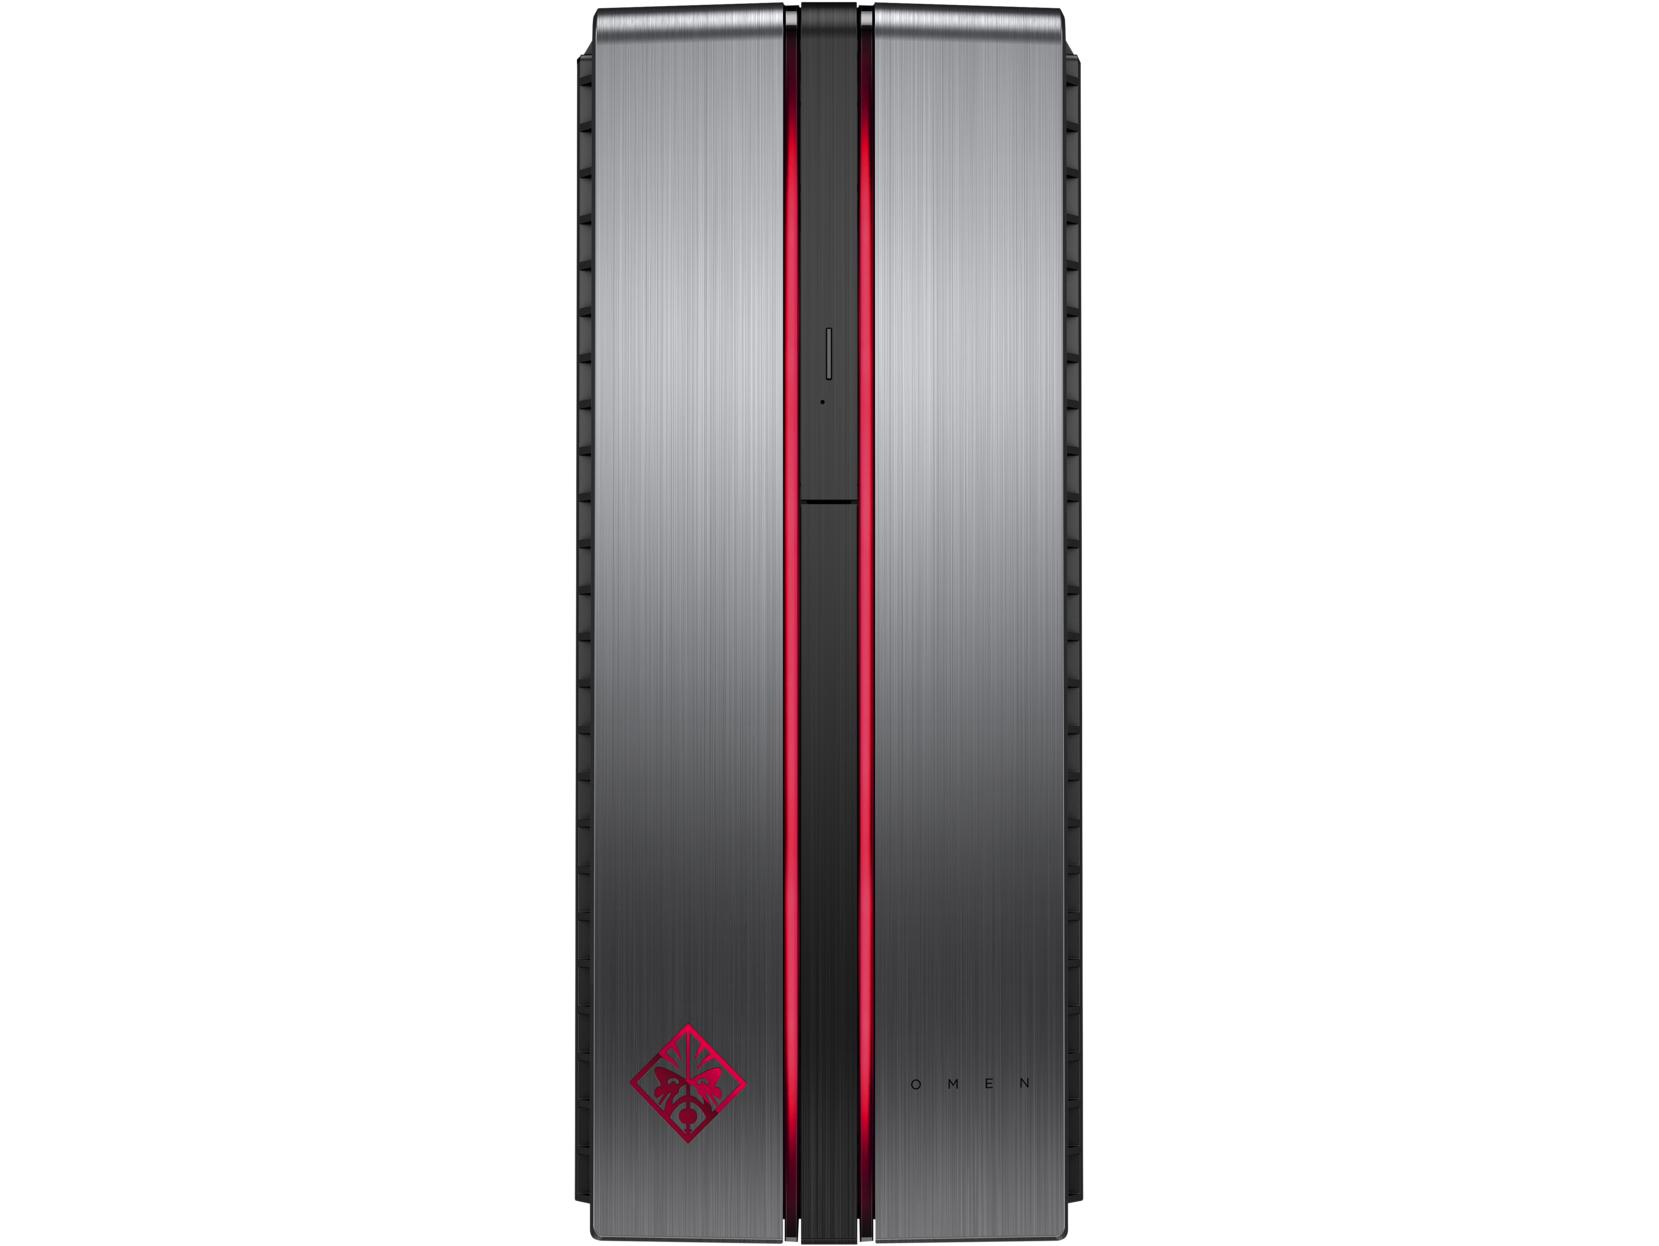 HP OMEN by Desktop PC - 870-080na (ENERGY STAR)